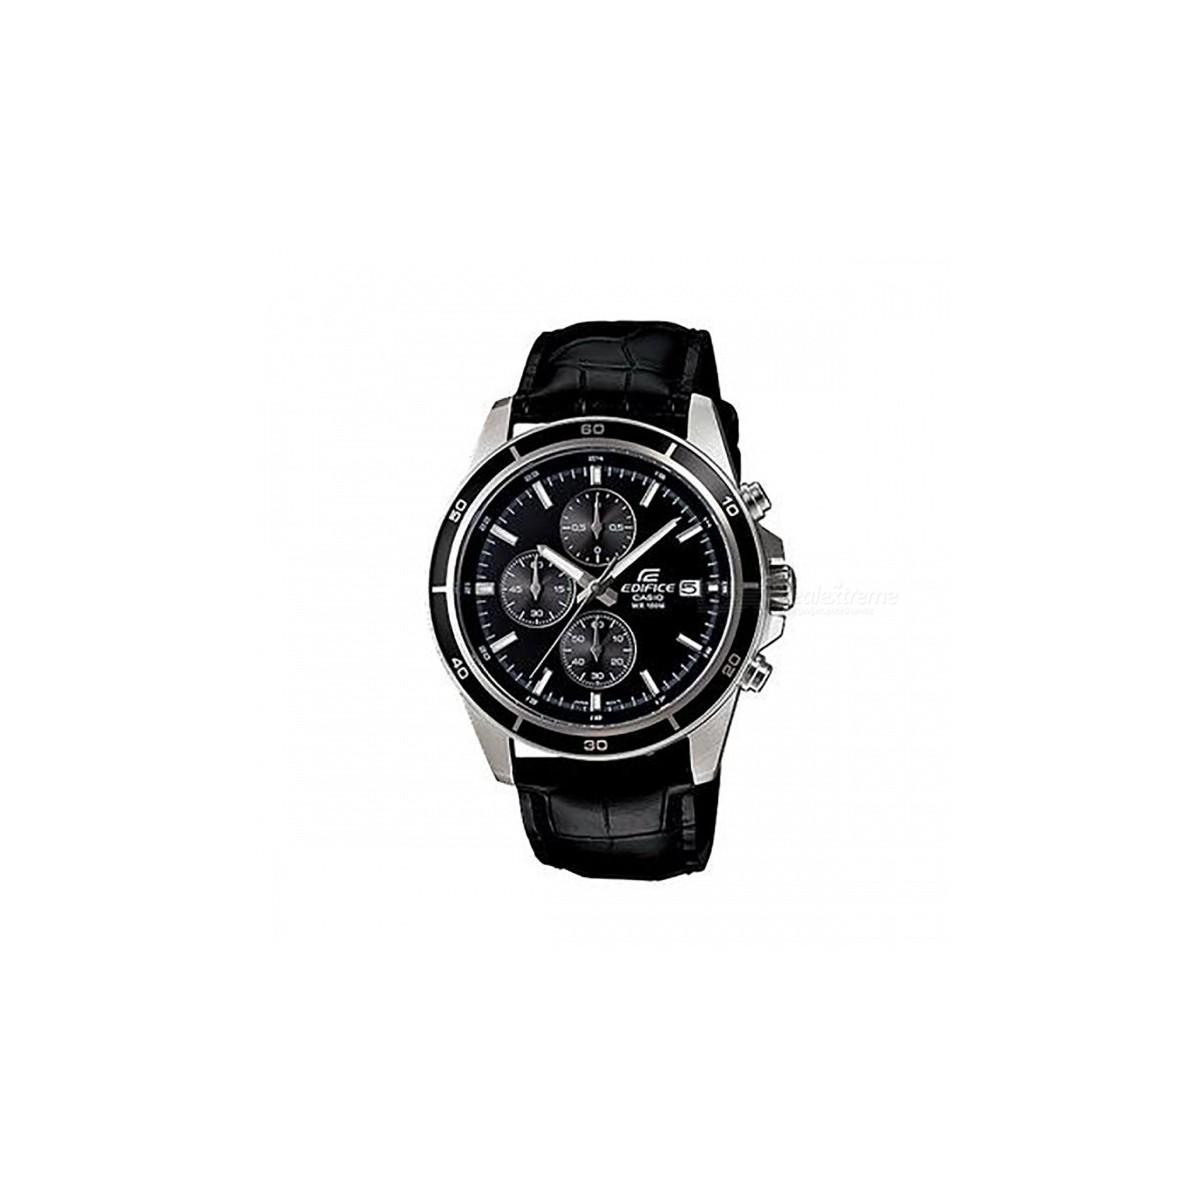 https://www.gaberjoyeria.com/4925-thickbox_default/reloj-casio-edifice.jpg